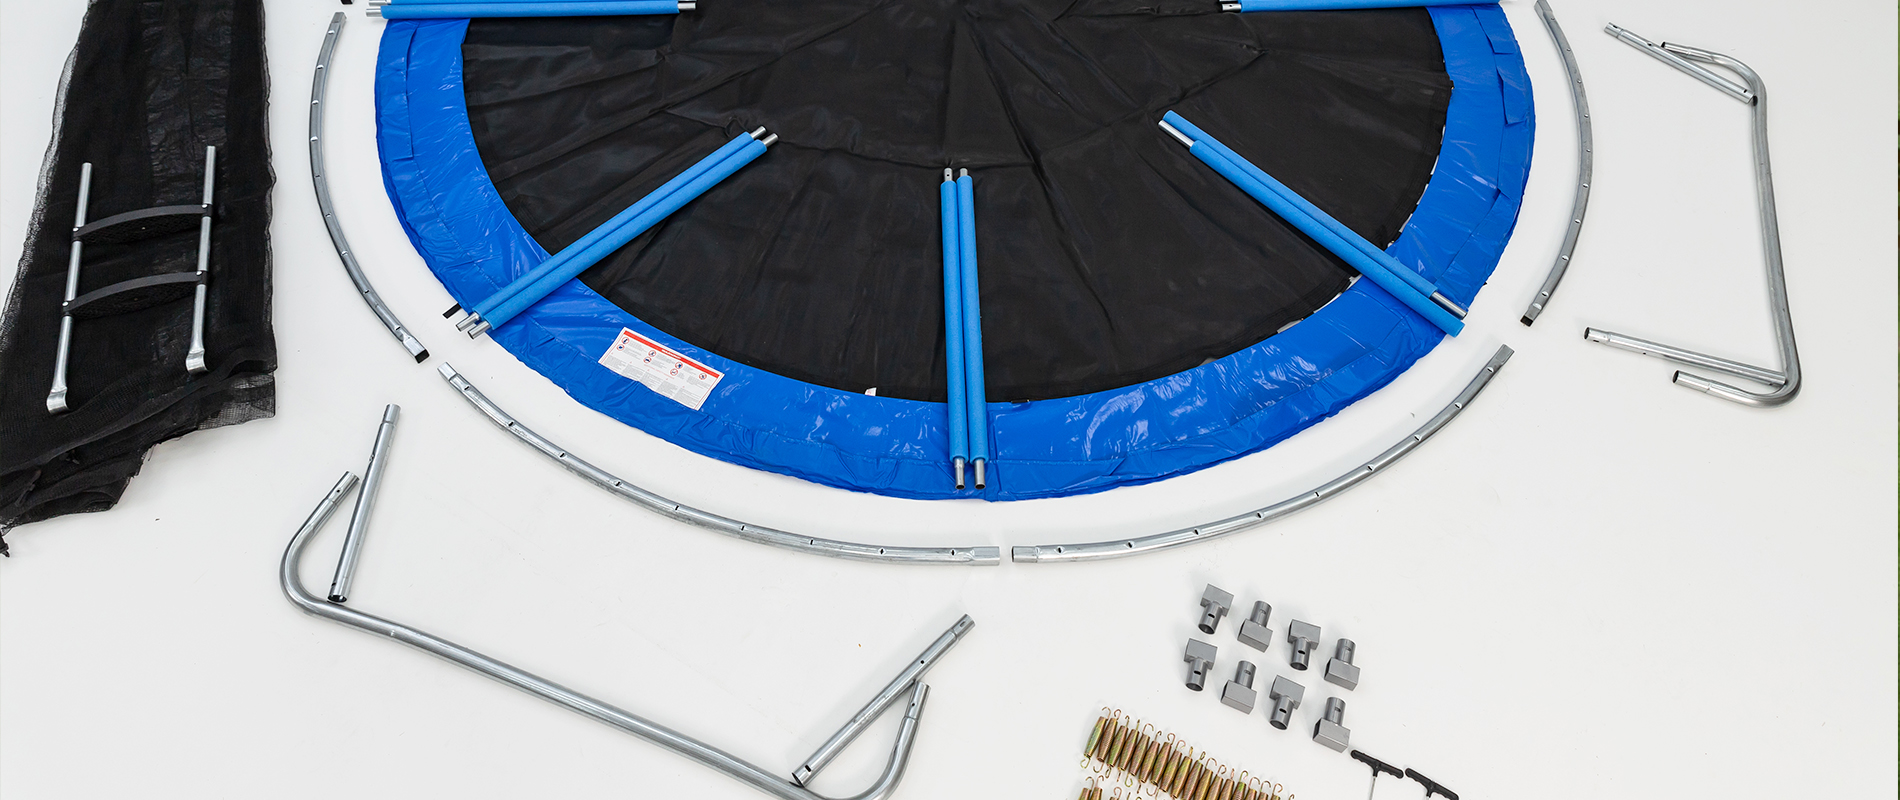 trampoline assembly problems